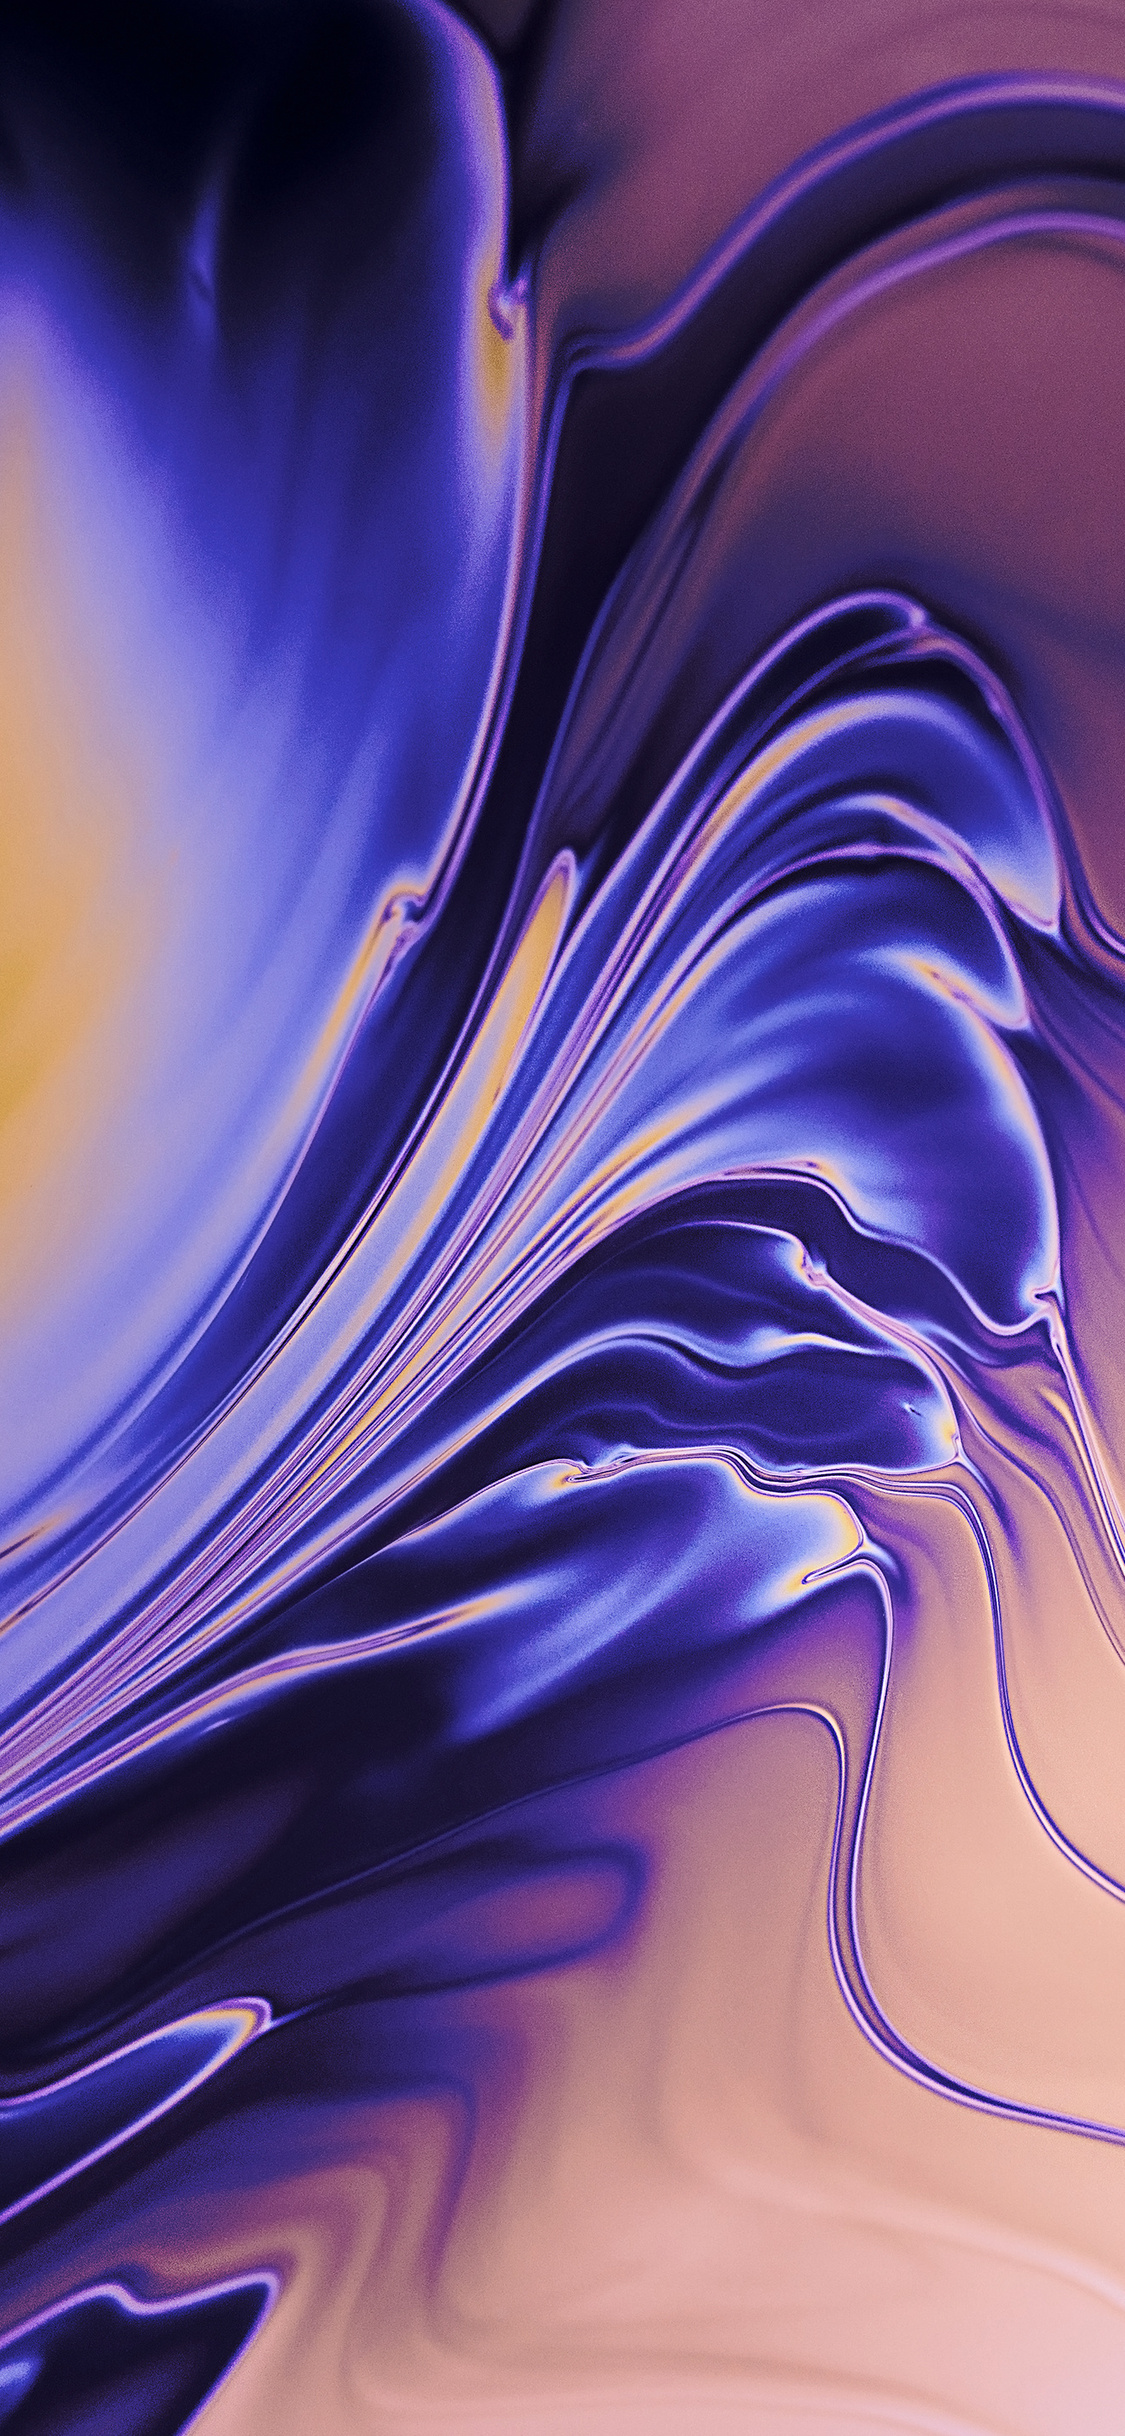 1125x2436 Abstract Liquid Flare 5k Iphone Xsiphone 10